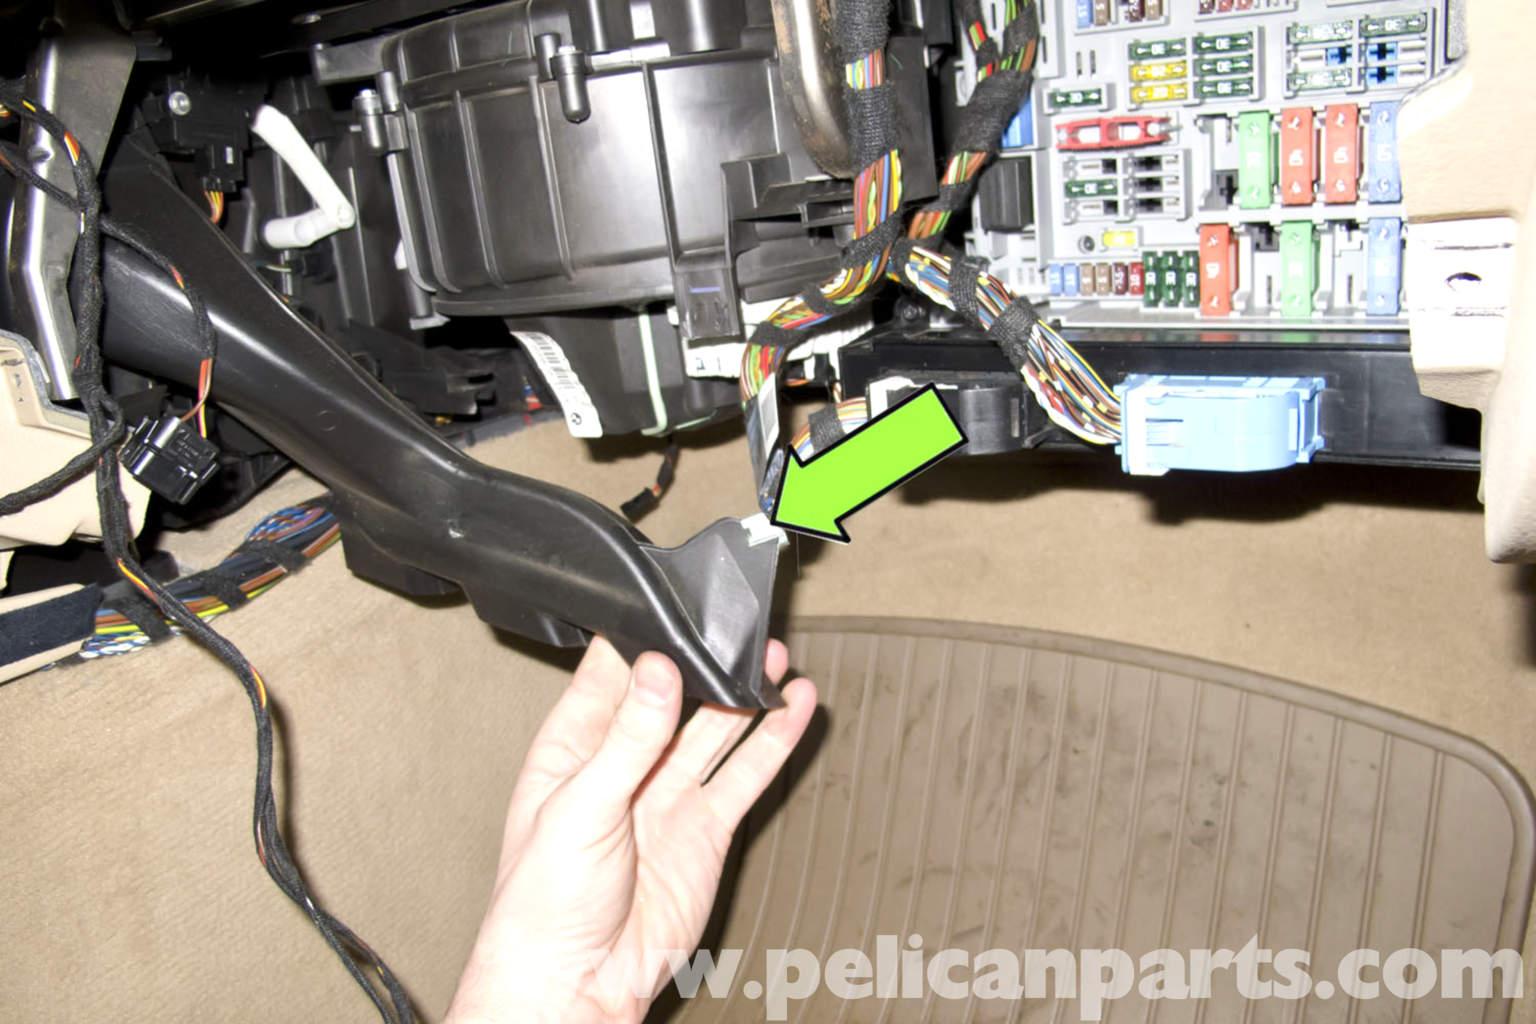 Bmw E90 Fuse Box Problem Wiring Diagrams Blower Motor Replacement E91 E92 E93 Pelican Parts Diy Instrument Cluster